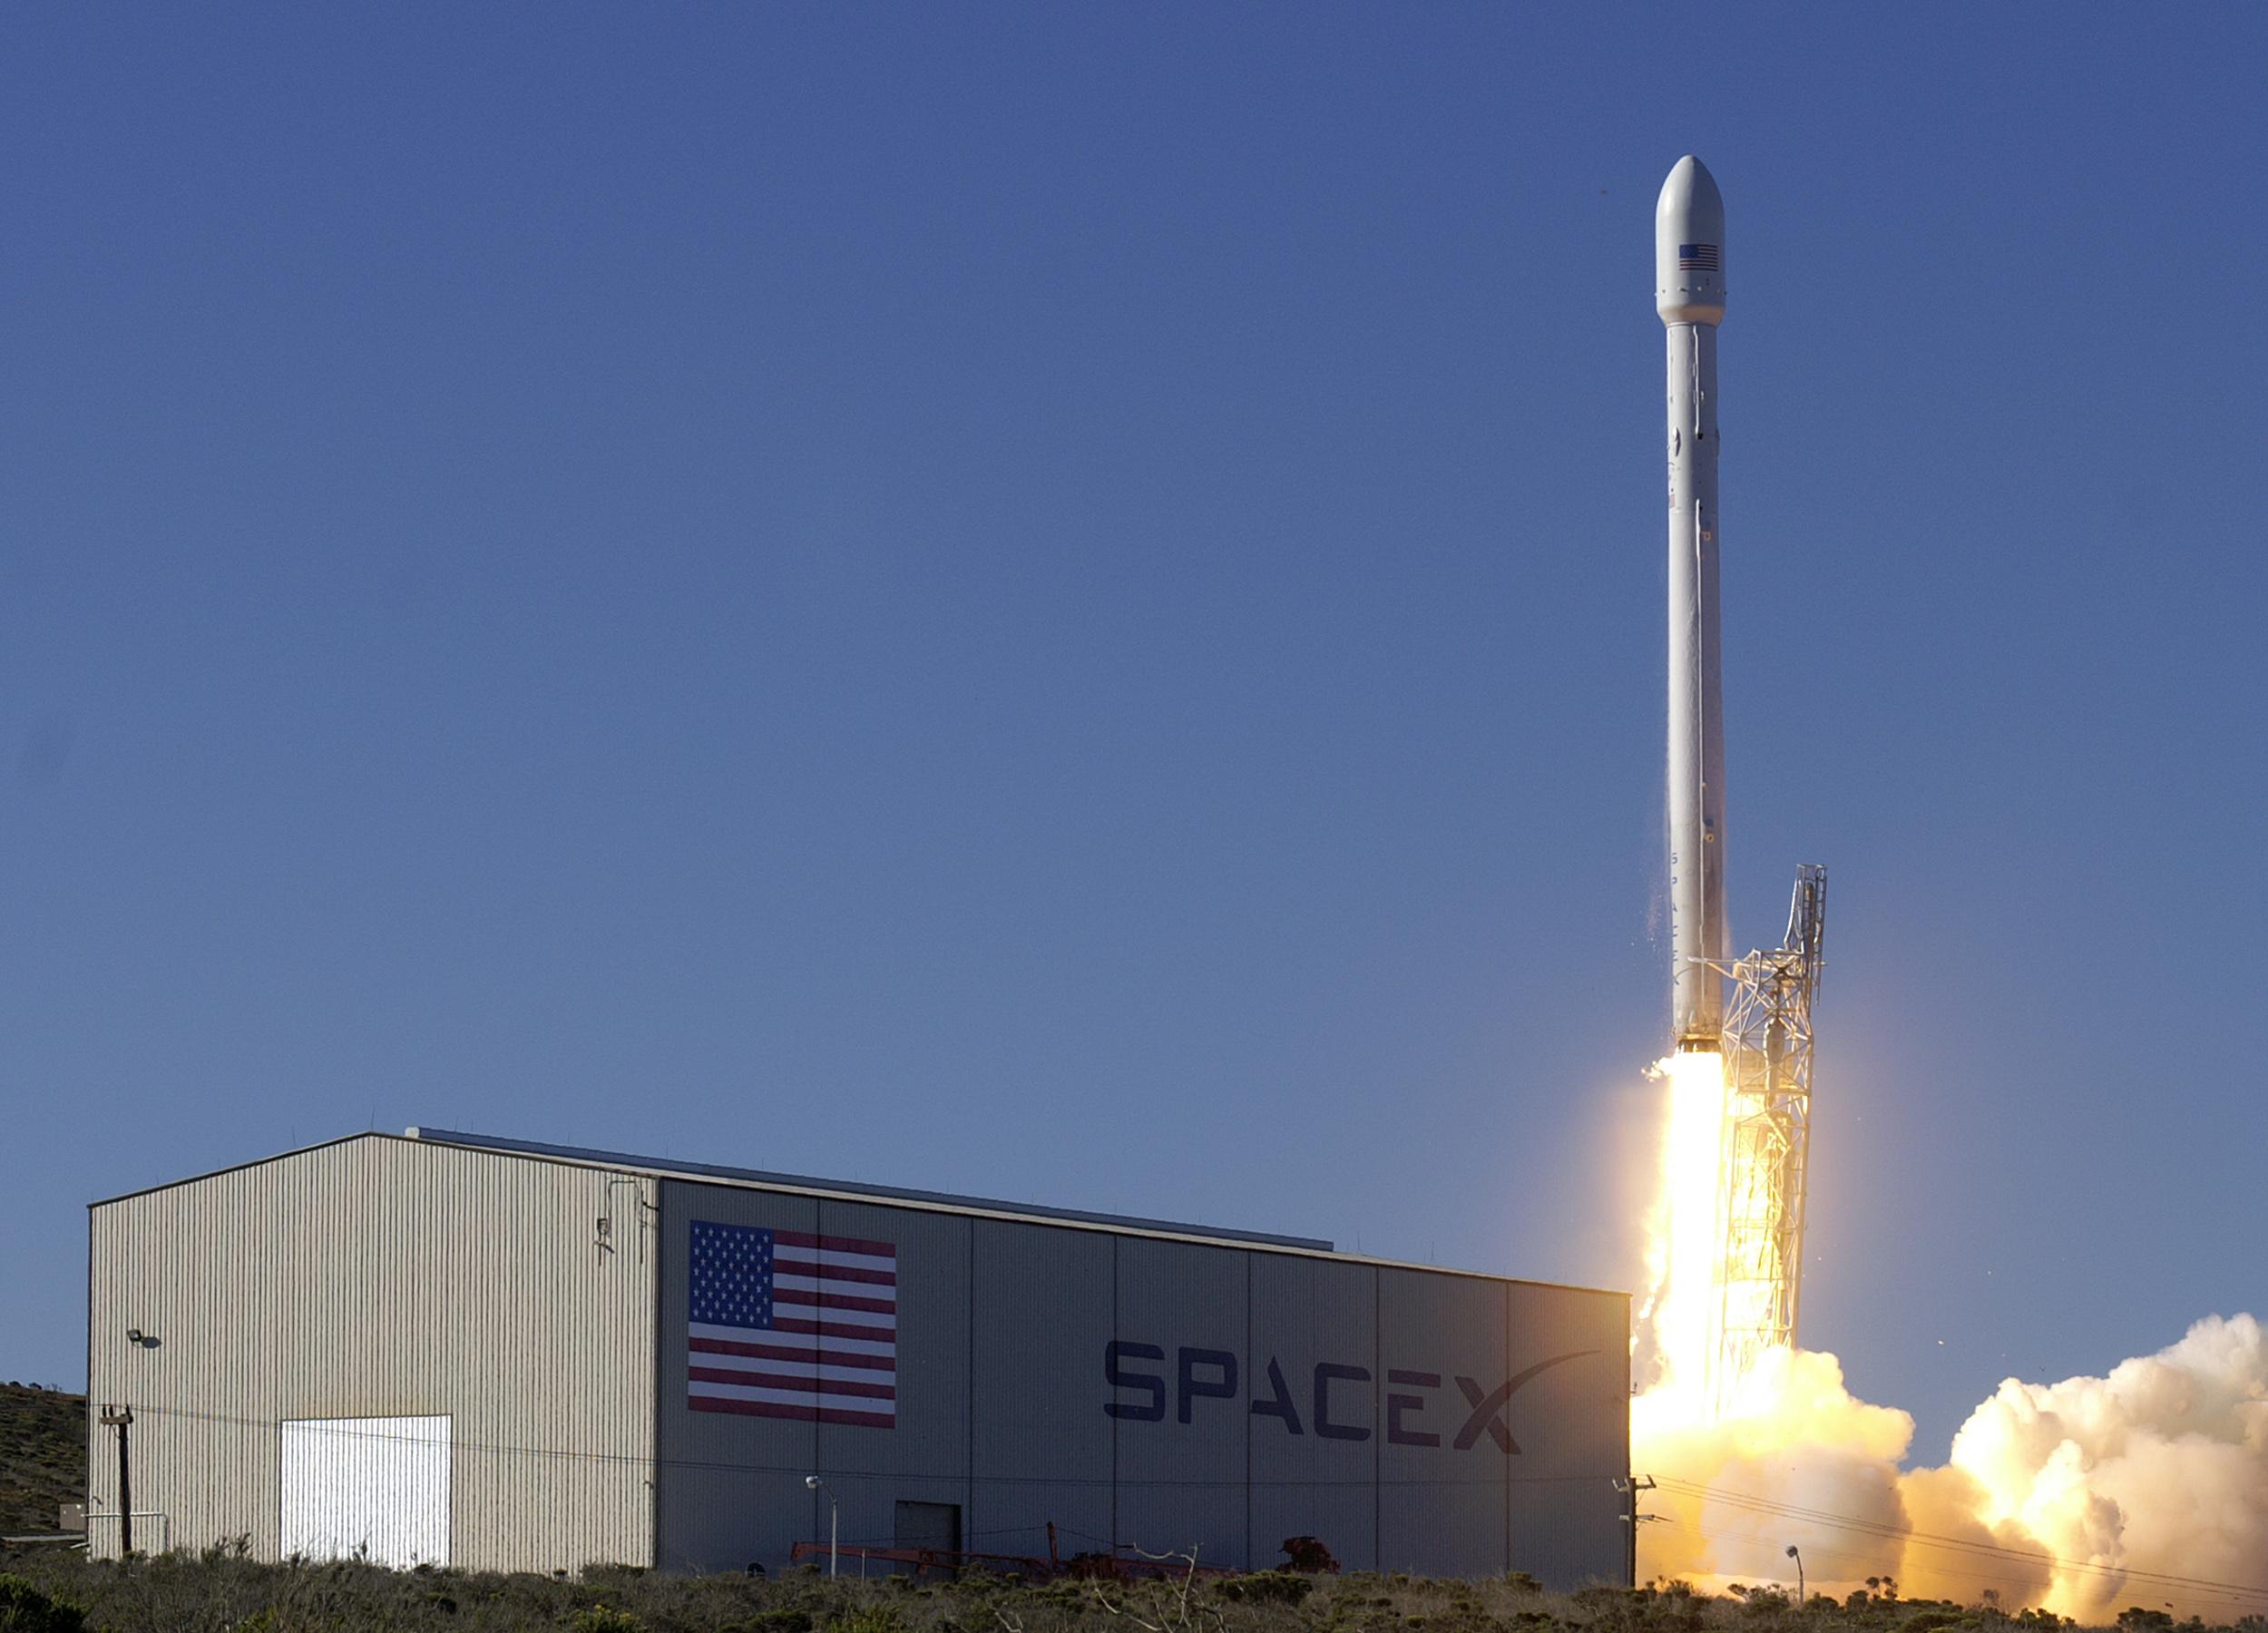 SpaceX удачно посадила первую ступень наплавучую платформу